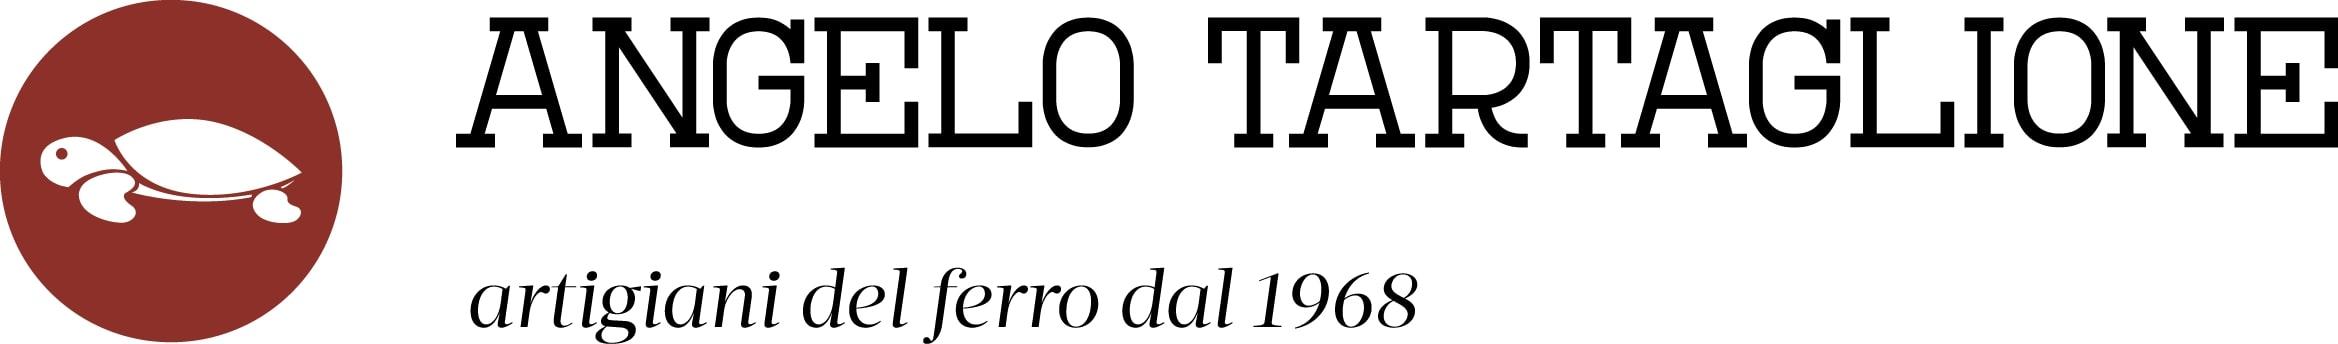 Angelo Tartaglione